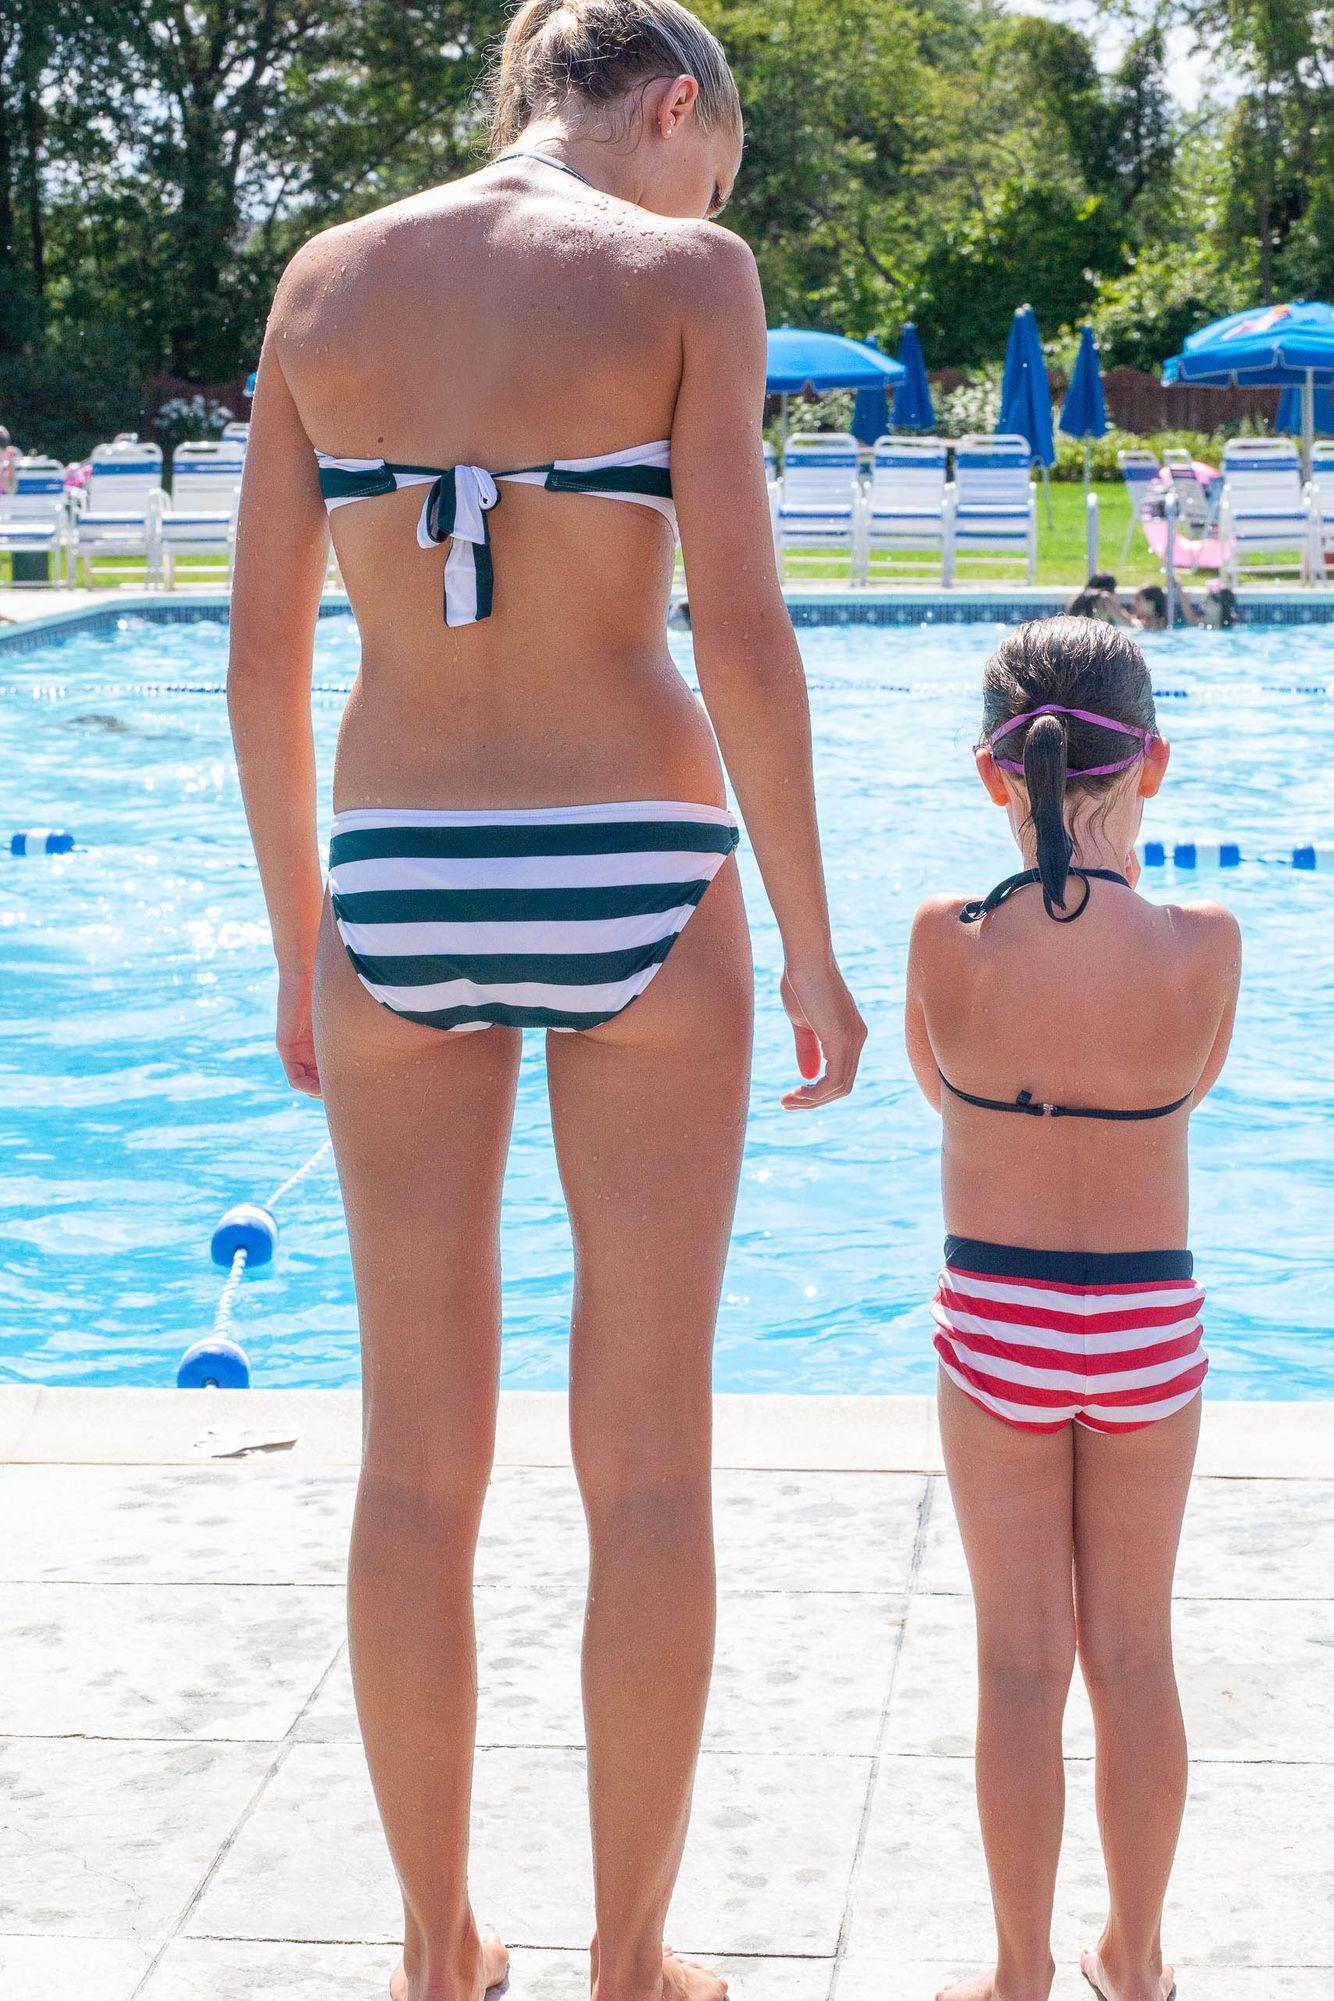 Sisters at pool